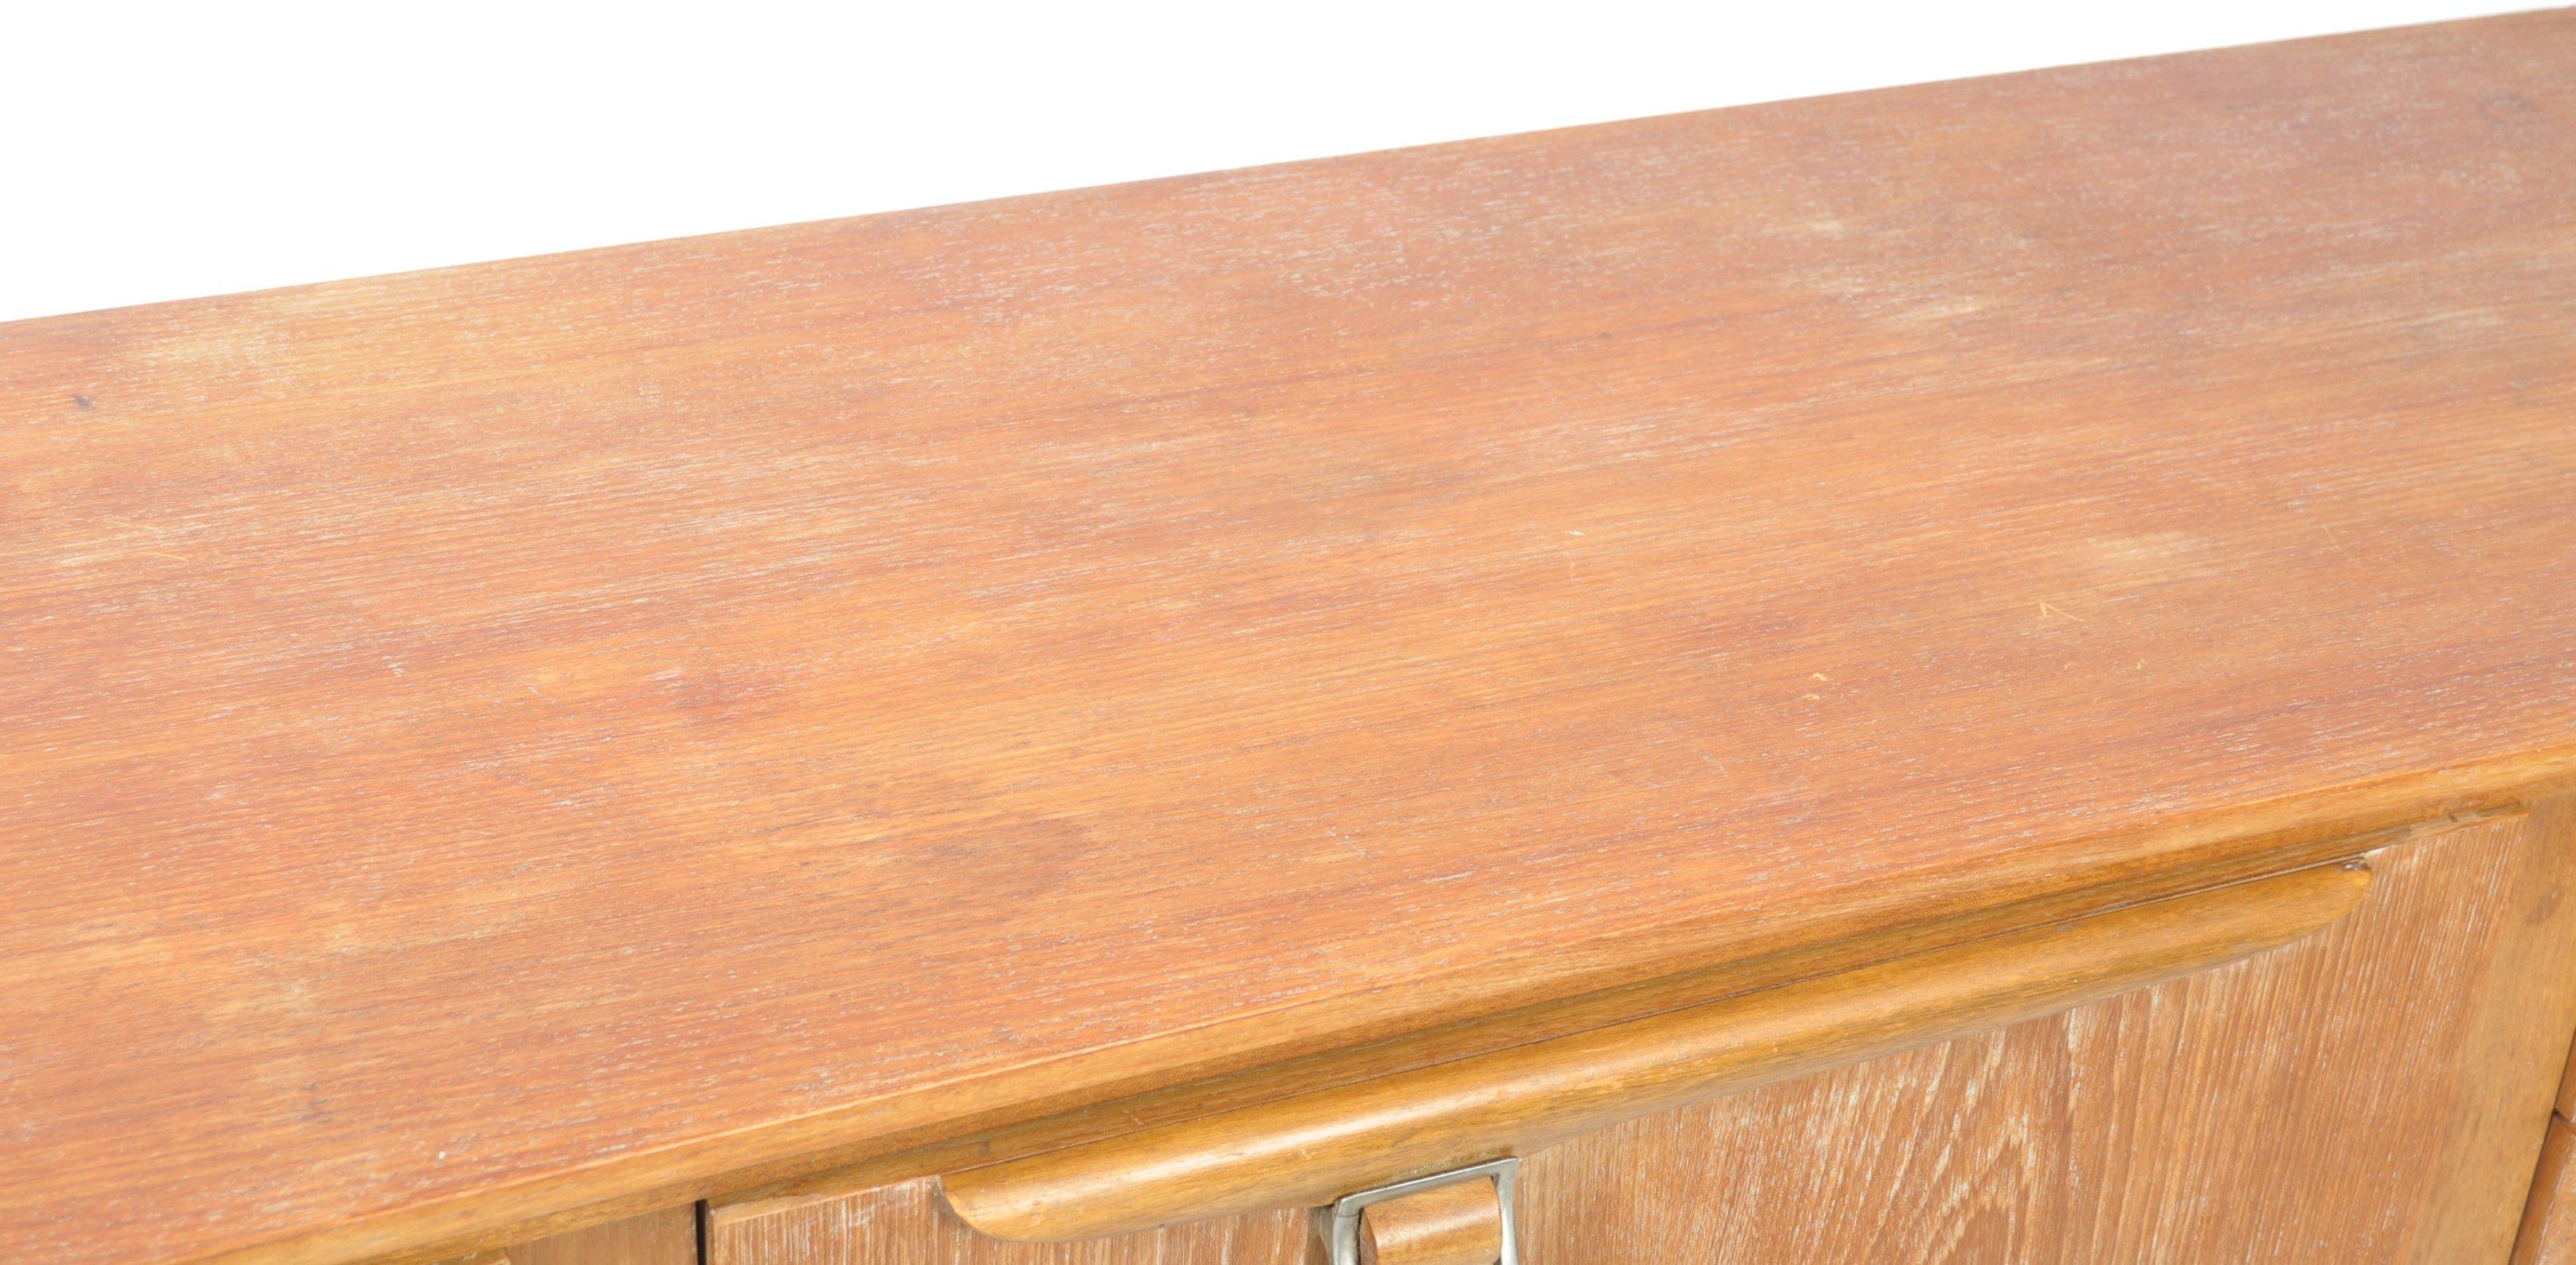 BEAUTILITY RETRO TEAK SIDEBOARD HAVING STYLIZED BELT BUCKLE HANDLES - Image 3 of 10